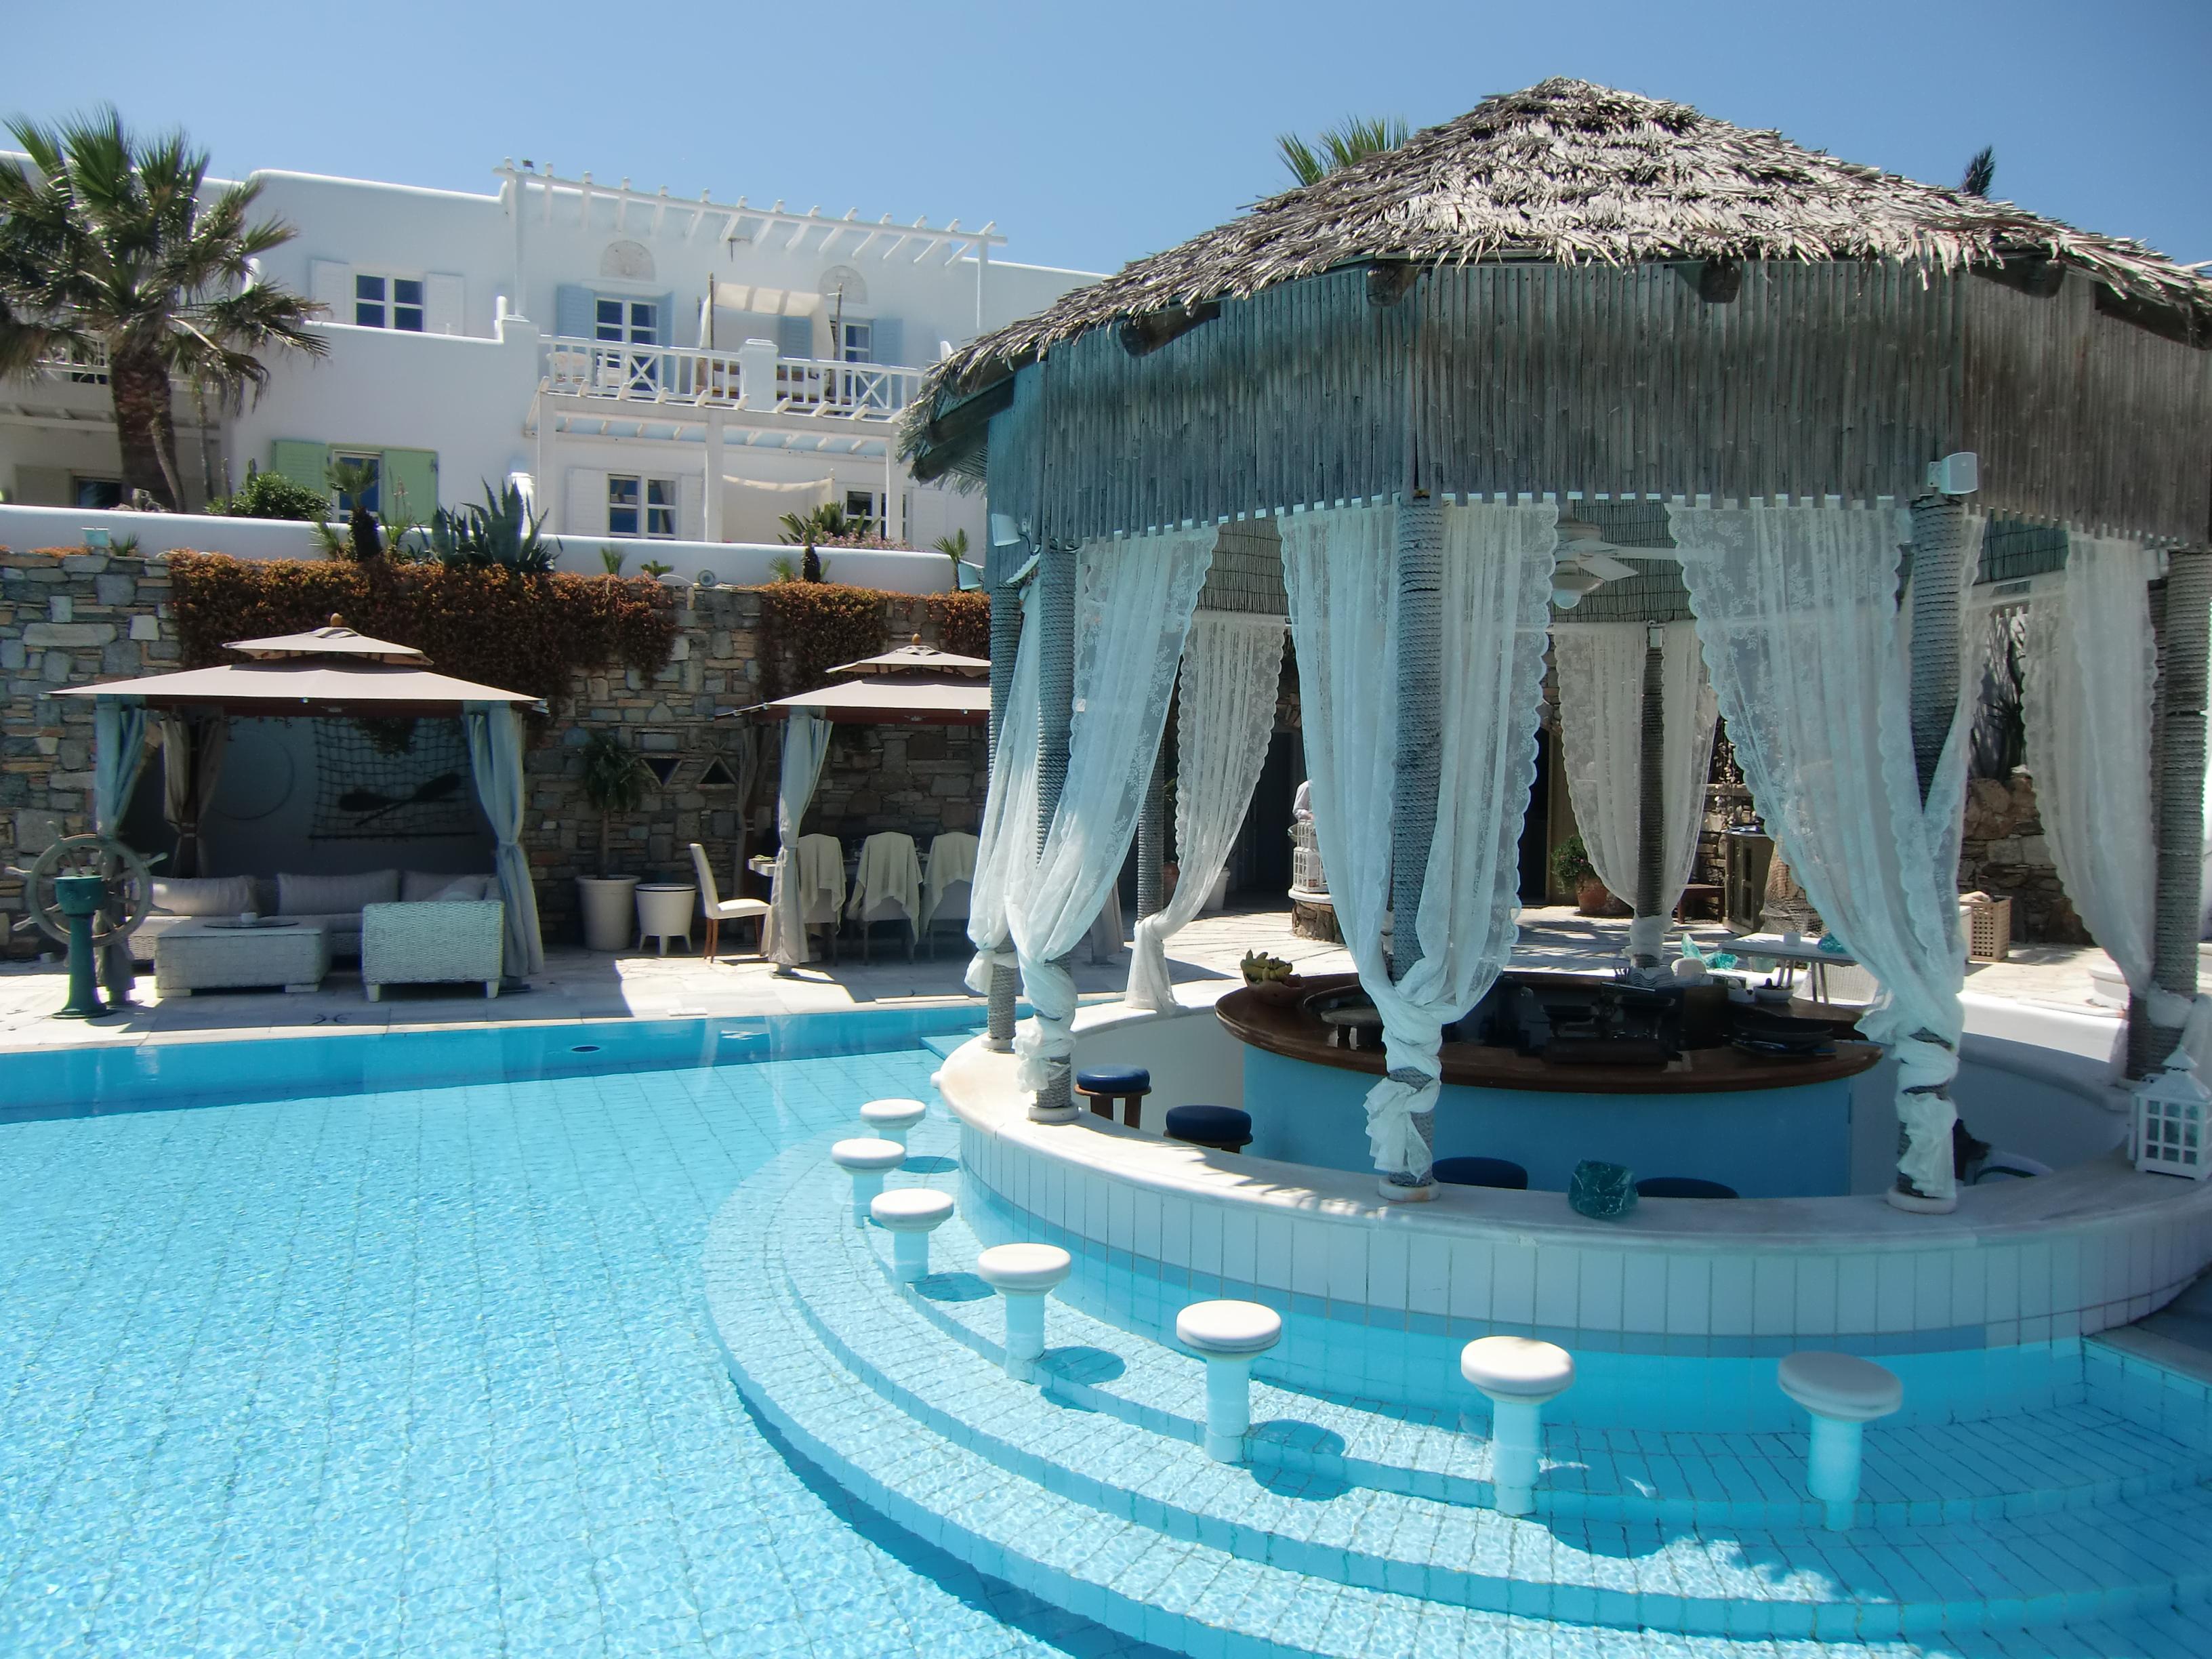 Greek Backyard Designs courtyard of a greek home with a beautiful mosaic floor Amazing